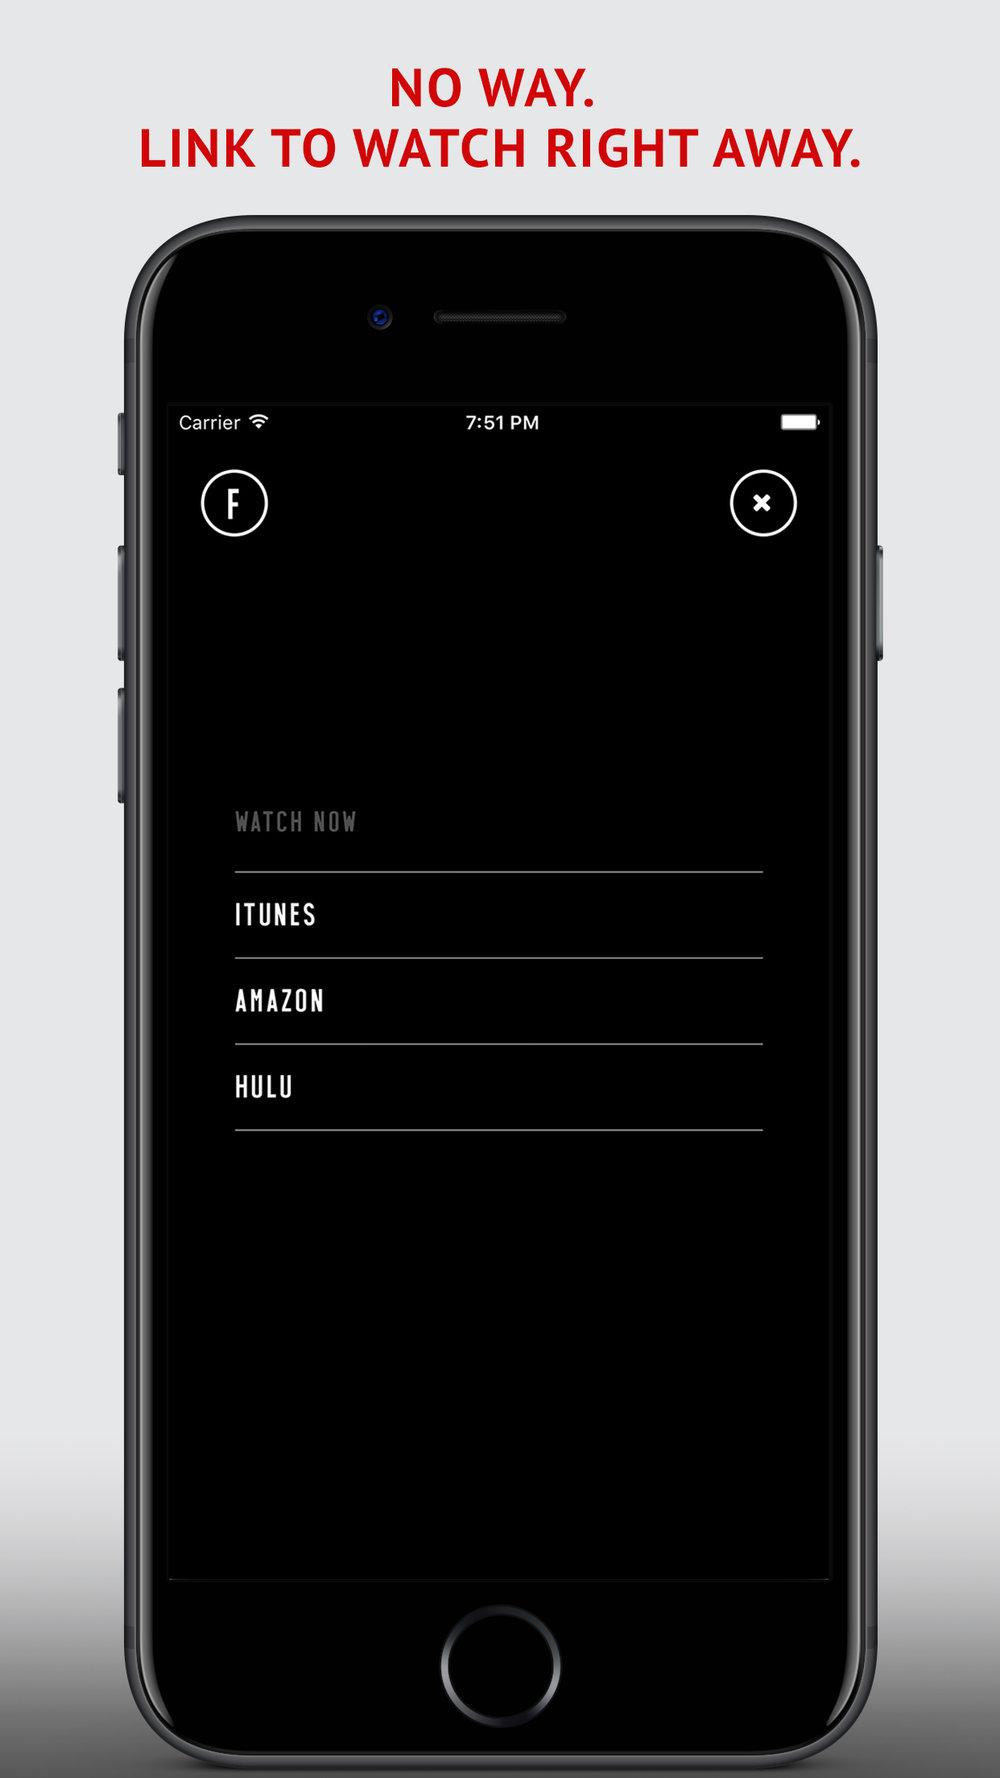 iphone_appstore_0004_watch now.jpg